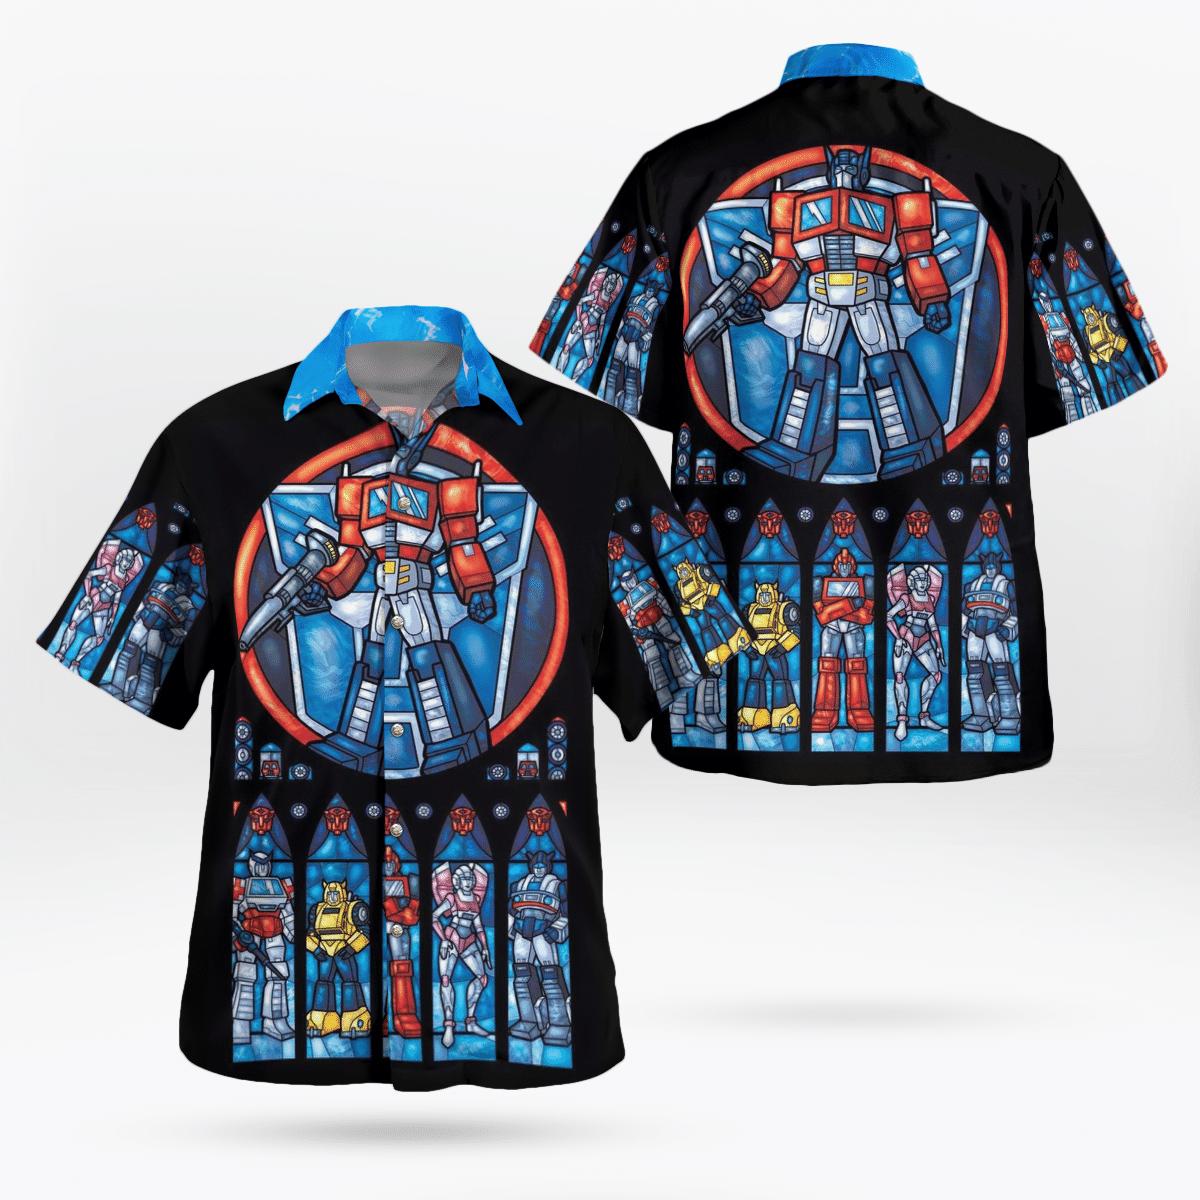 Transformers Hawaiian Shirts Summer Shirt